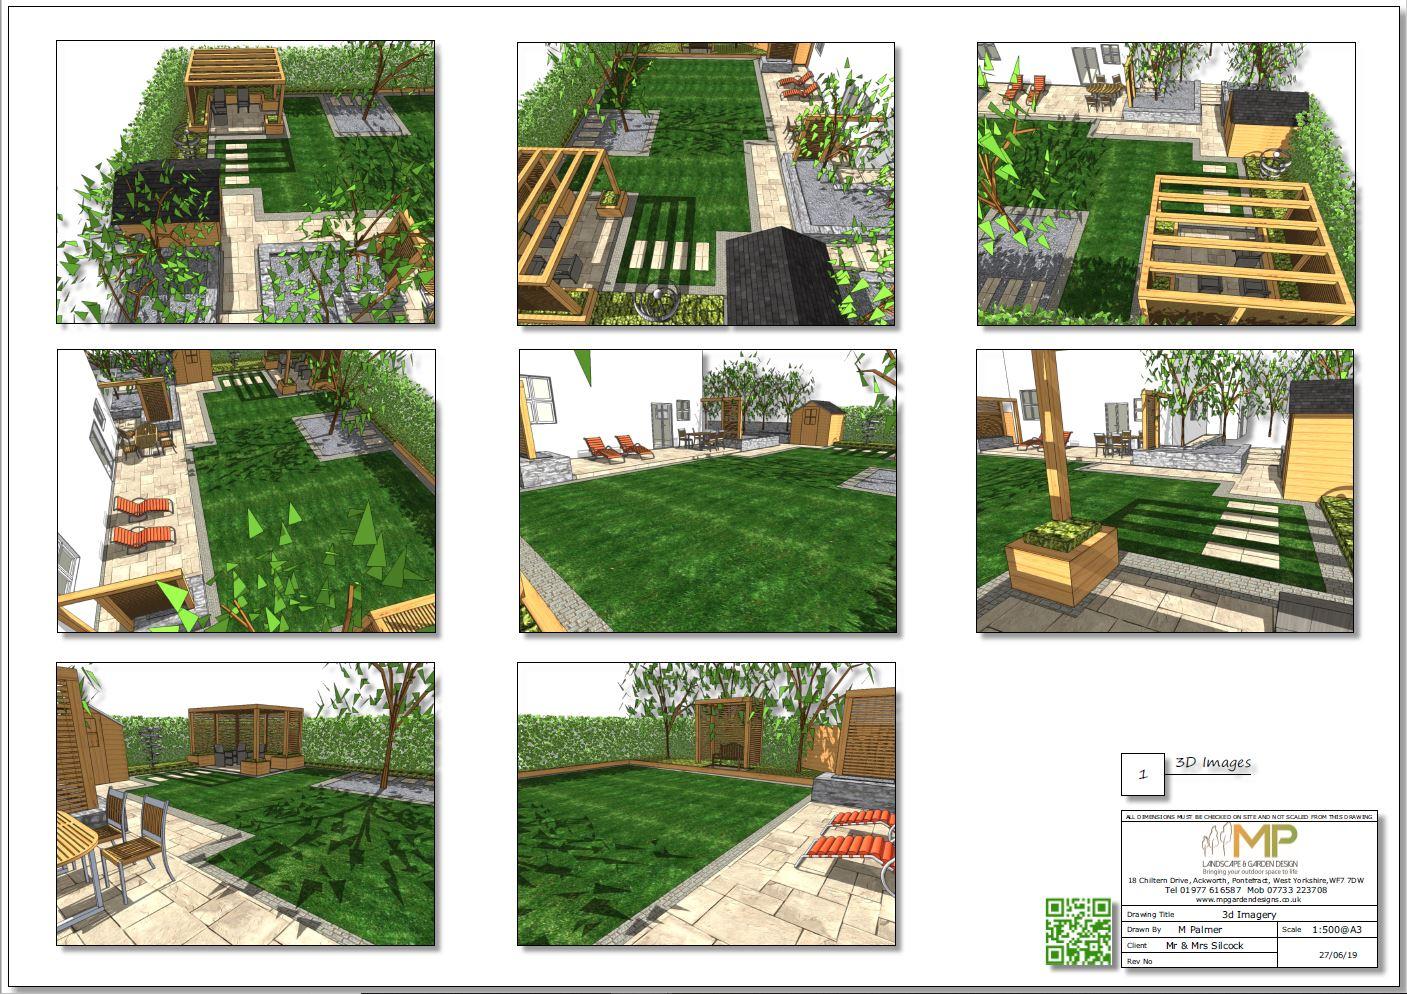 3, Garden layout 3D plan for a property in Mickelfield